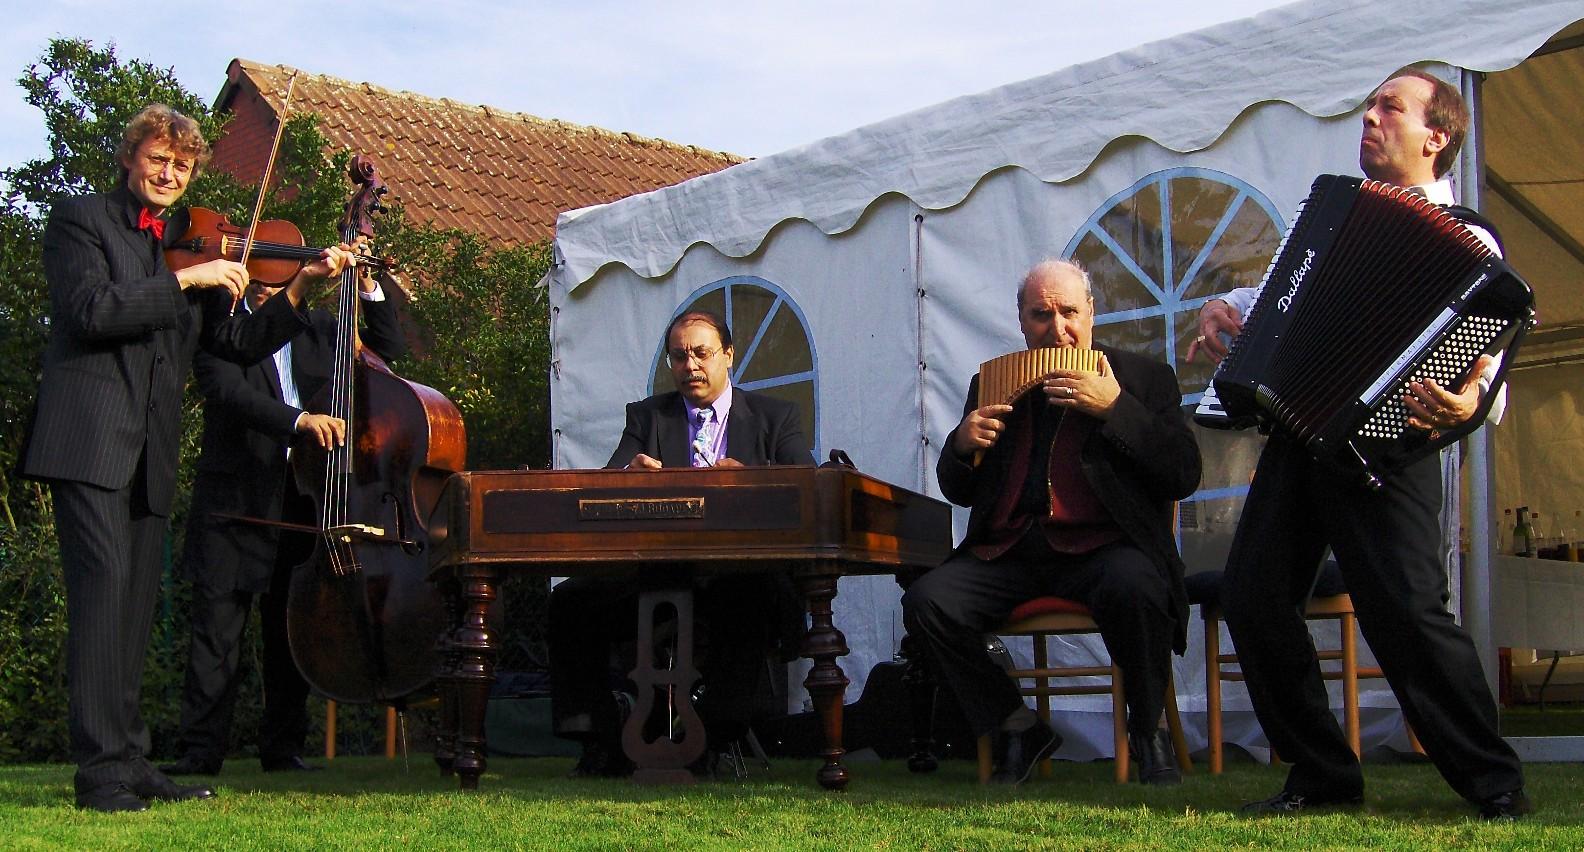 Piroska gypsy music with Janos Kekenj, Iulian Jantea,